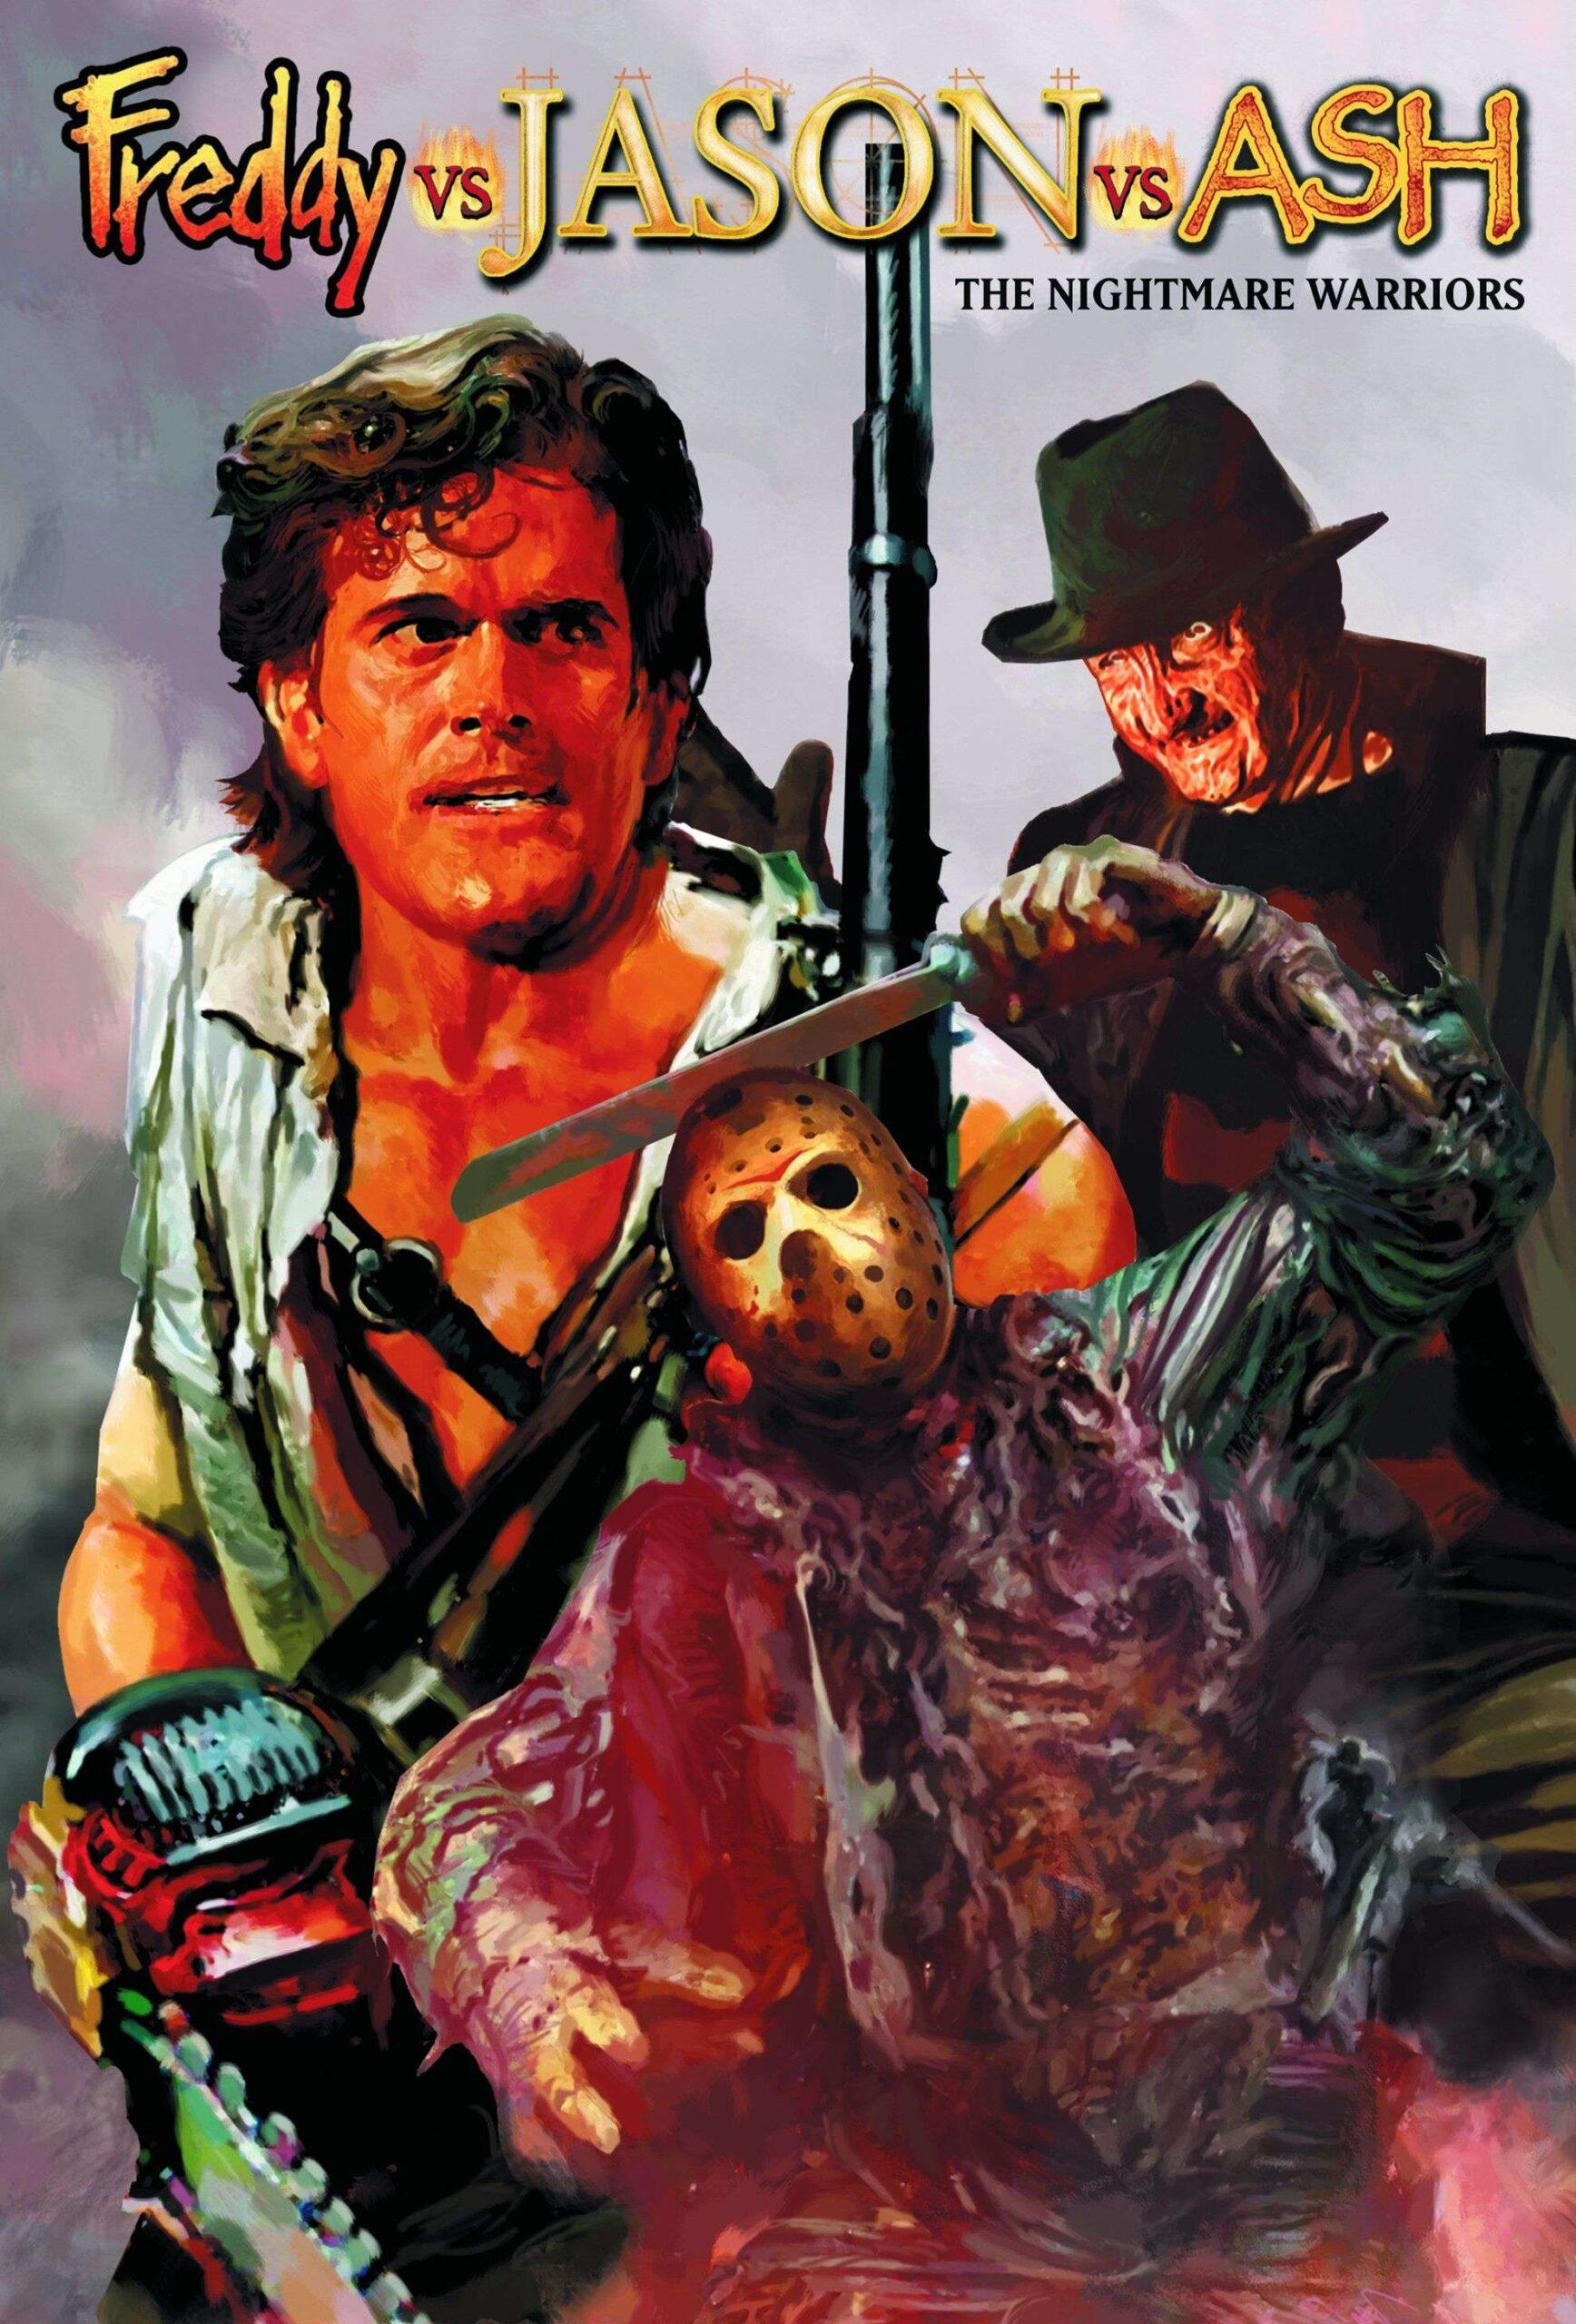 Freddy vs. Jason vs. Ash The Nightmare Warriors